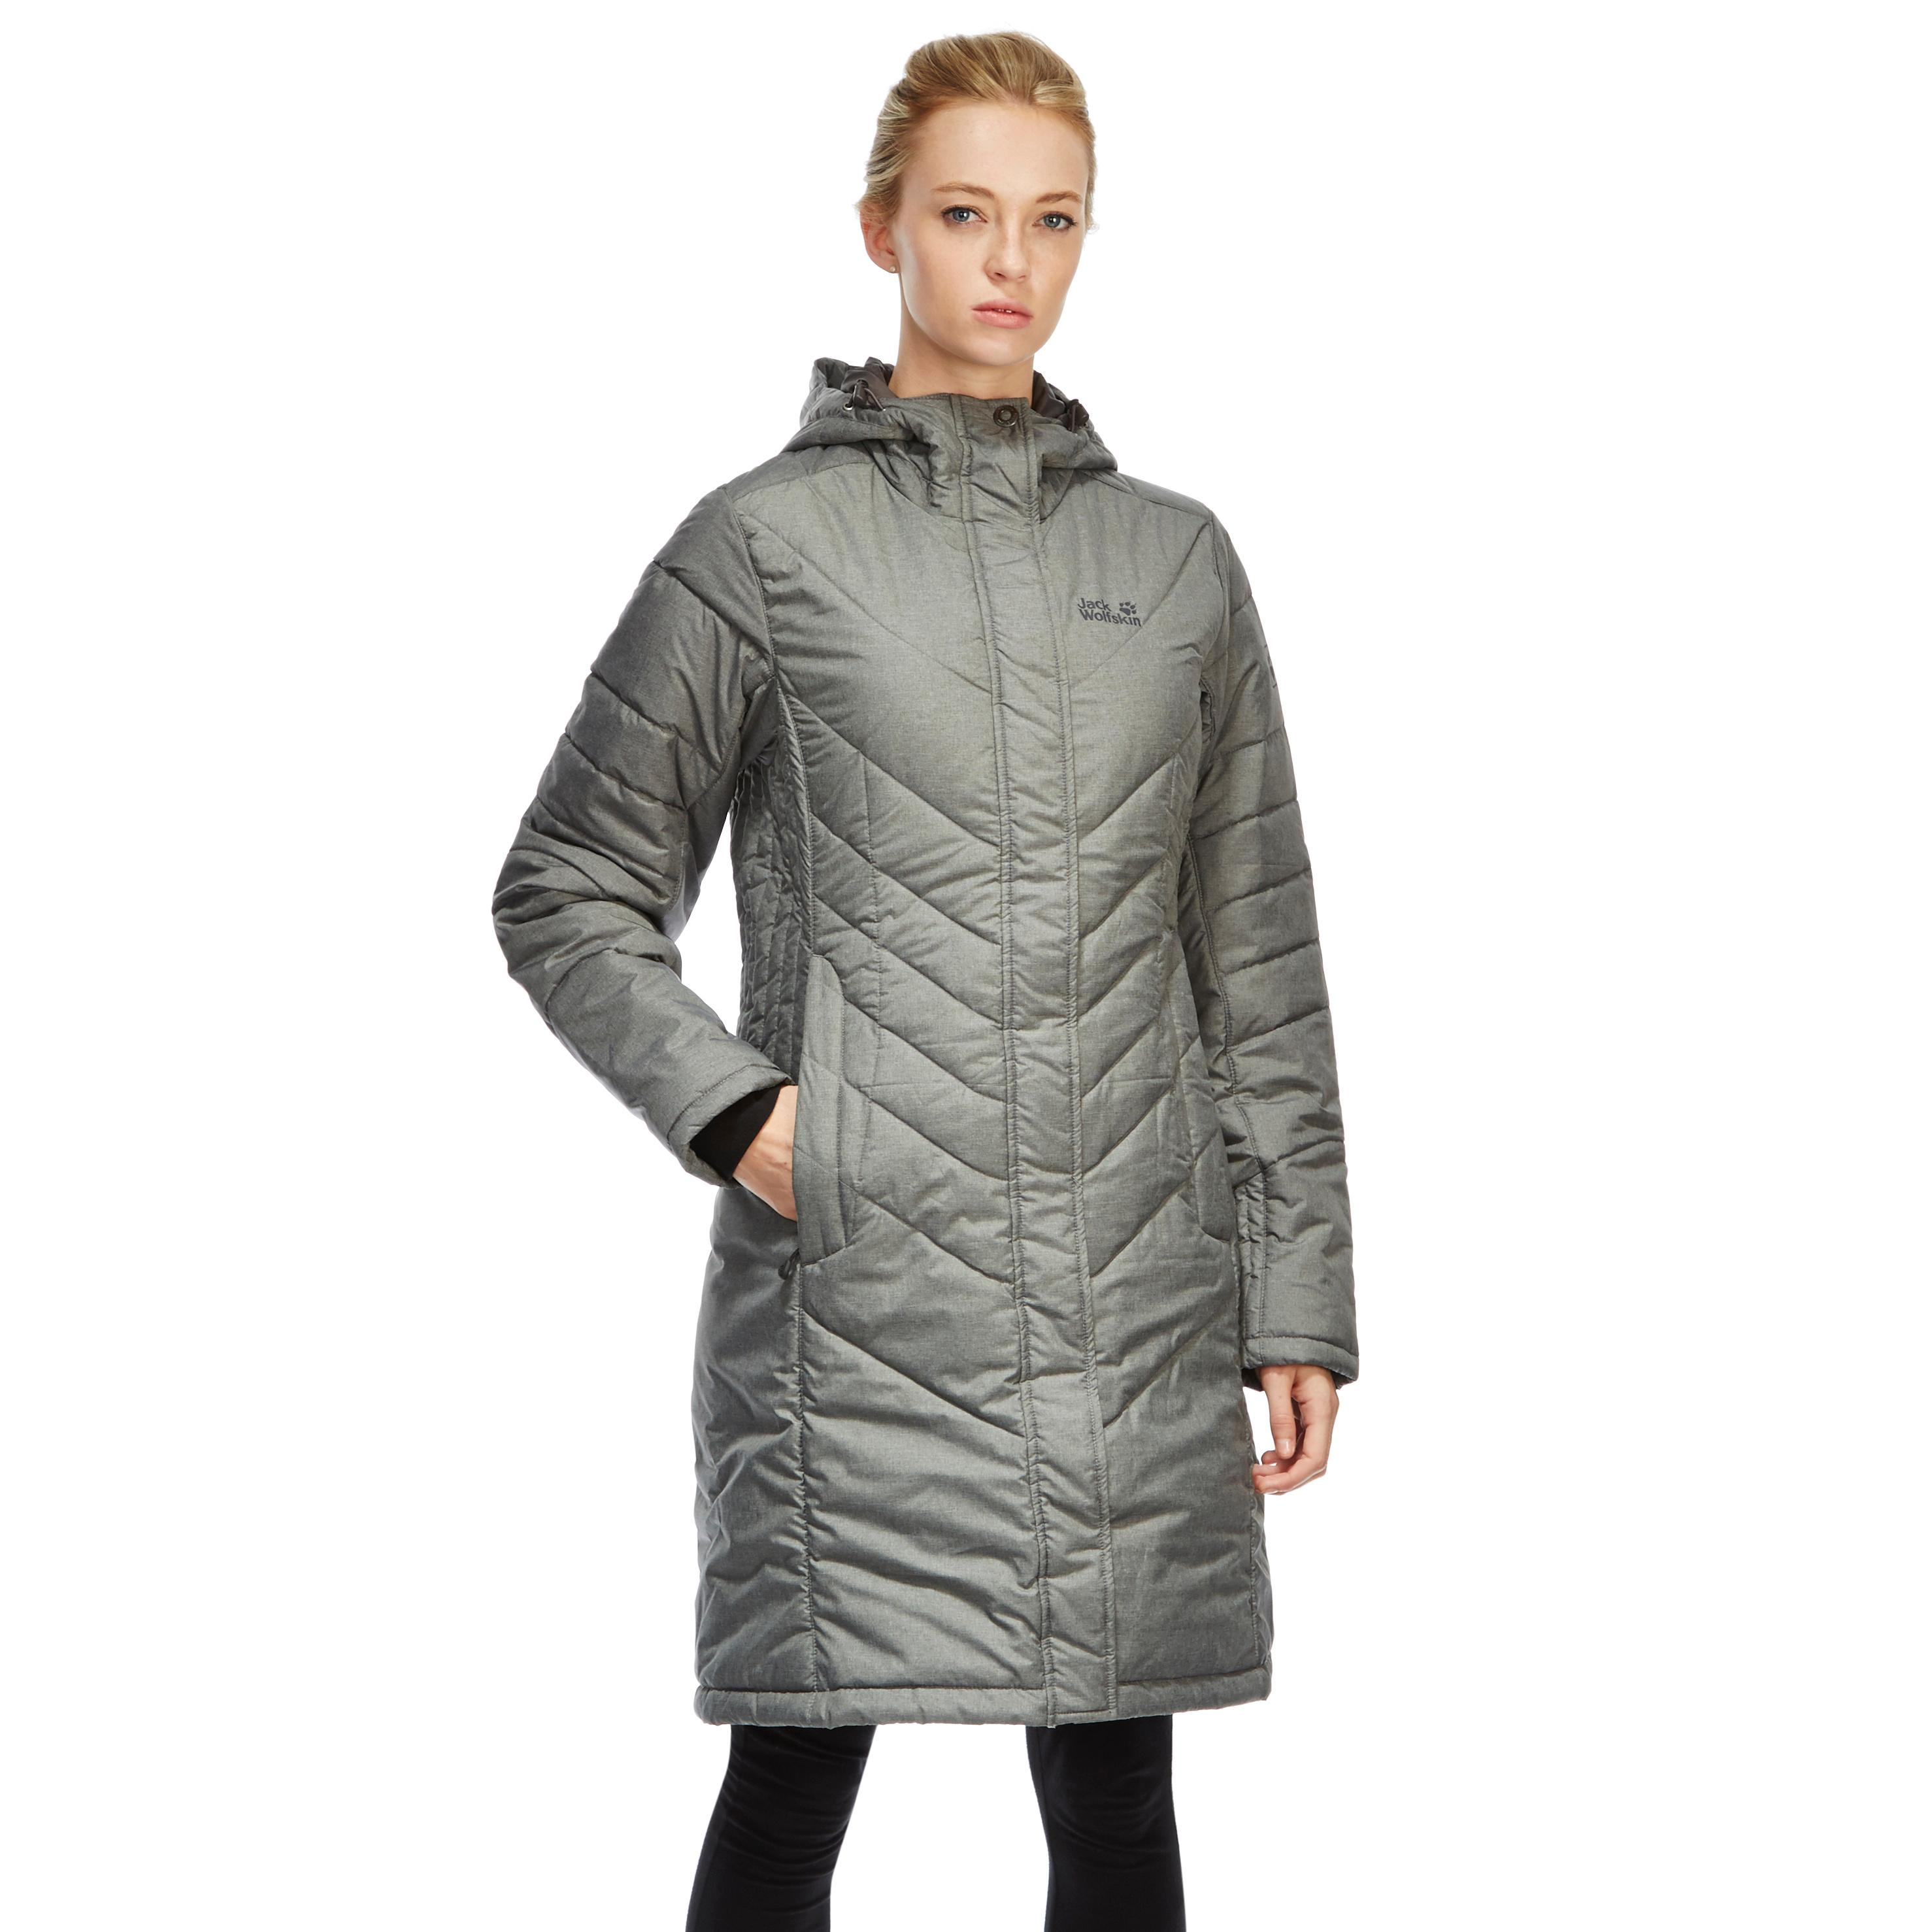 Jack wolfskin womens coats